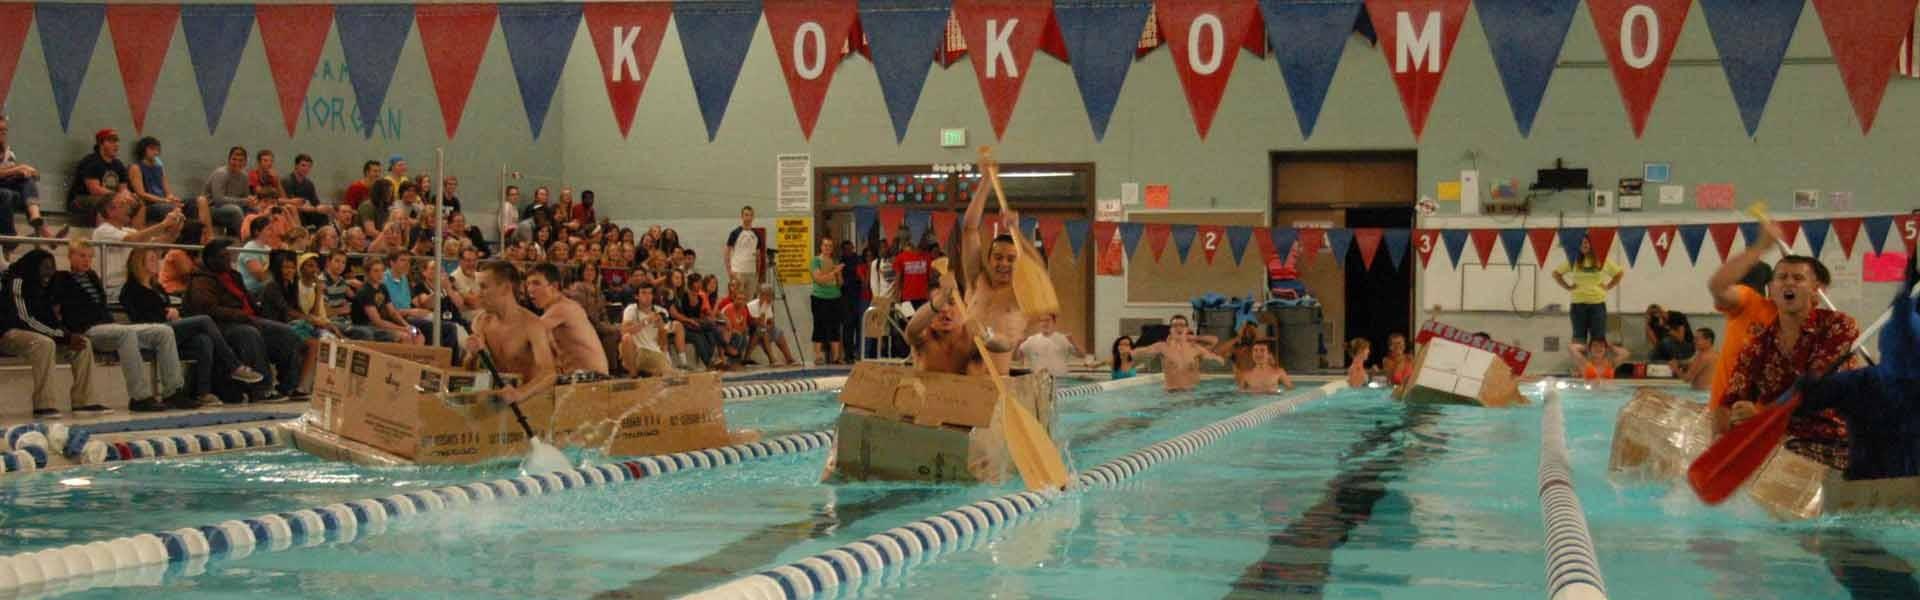 Kokomo-Highschool-IN-Pool-MAin-Banner-US-2019